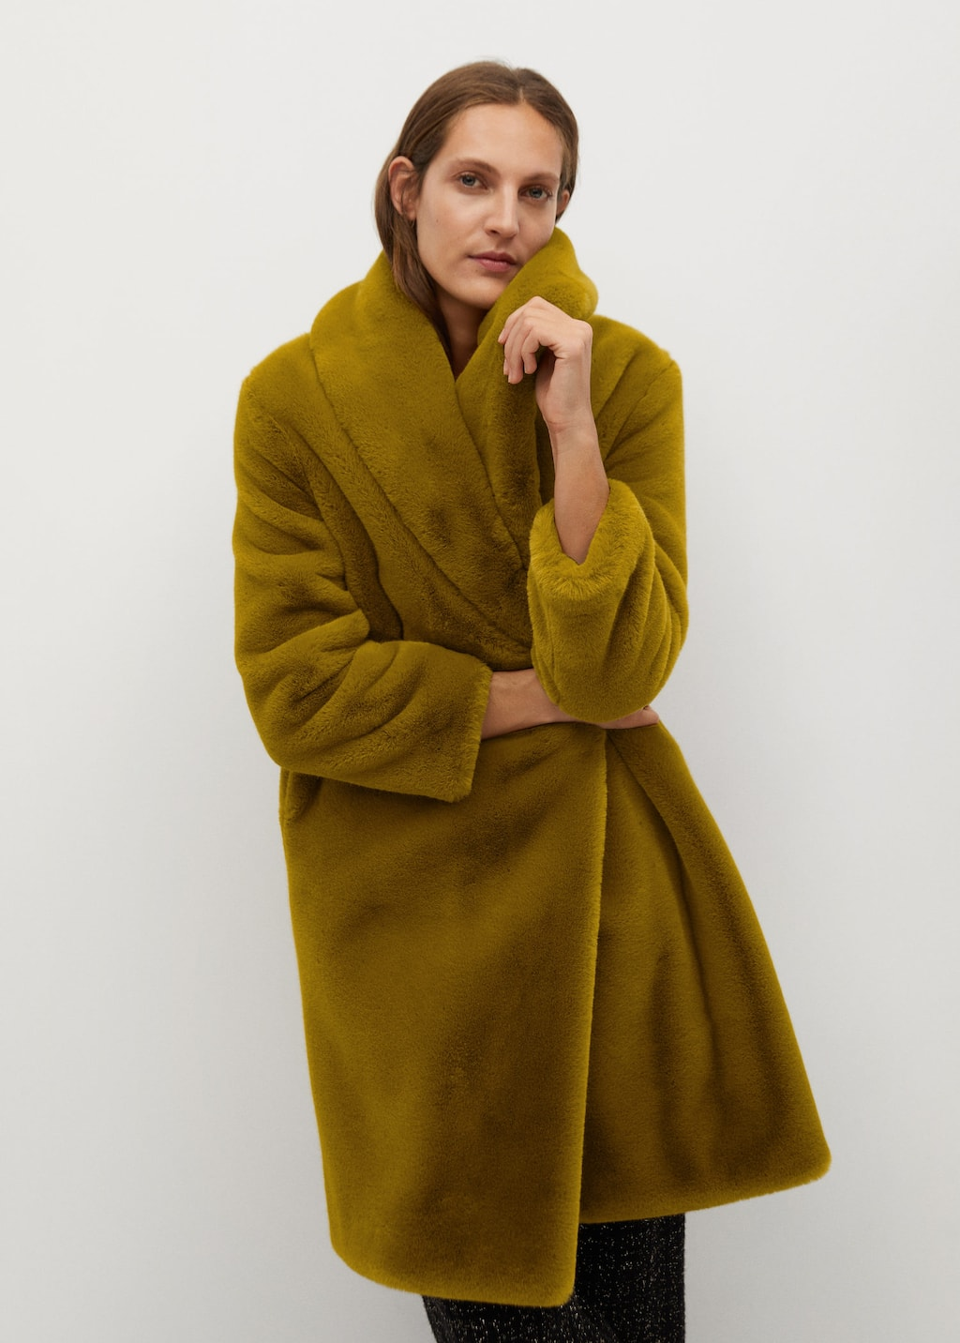 Fluffy long coat - Medium plane